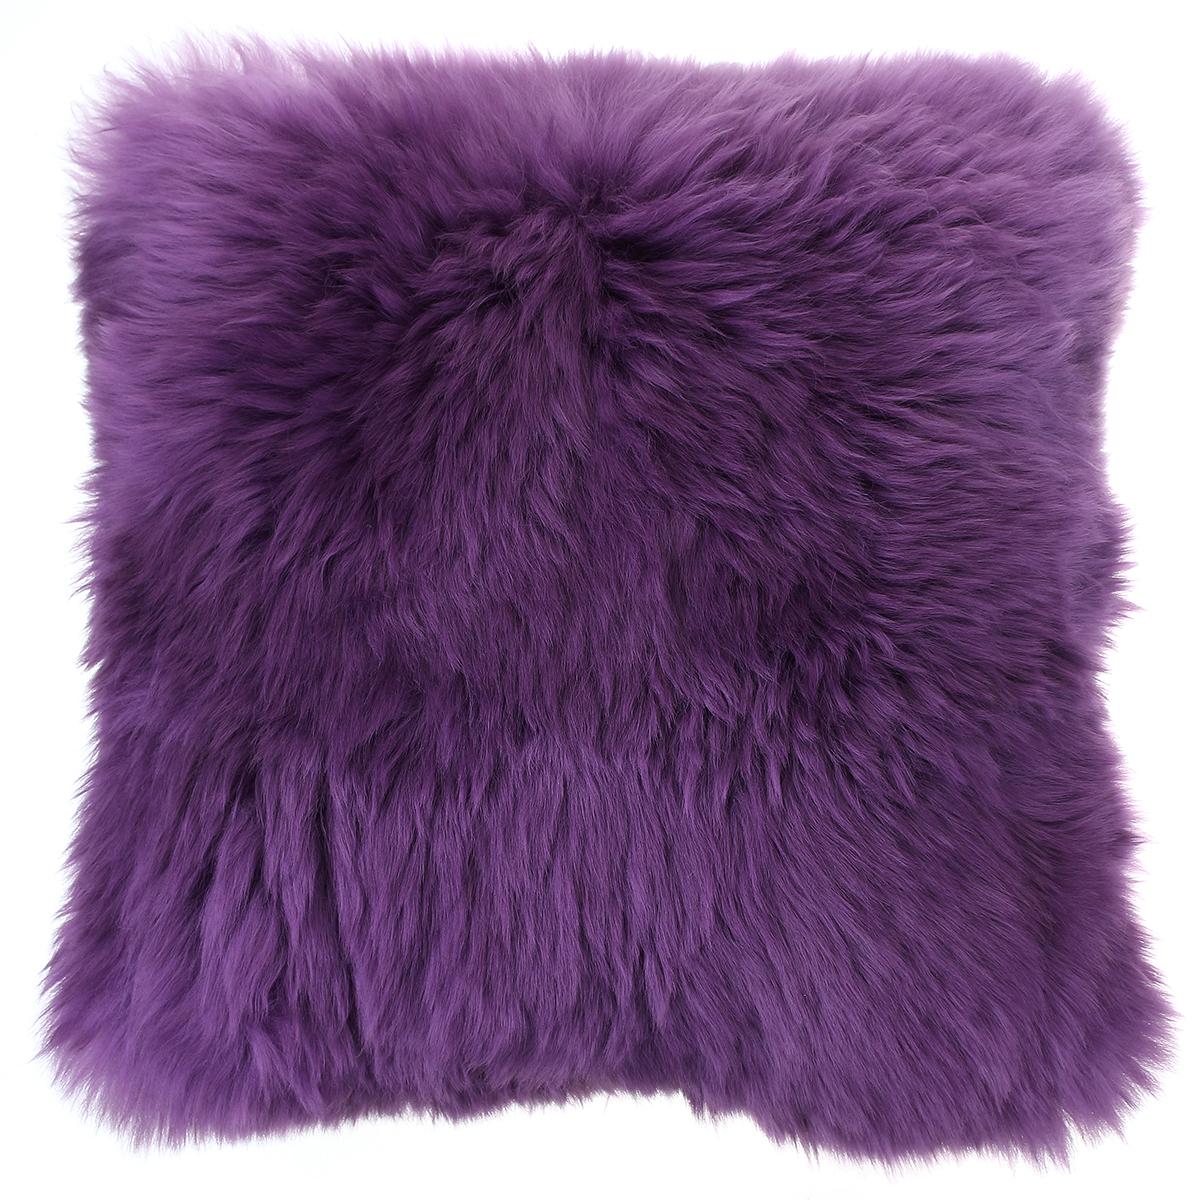 High Quality Sheepskin Wool Back Cushion Long Hair Fur Bed